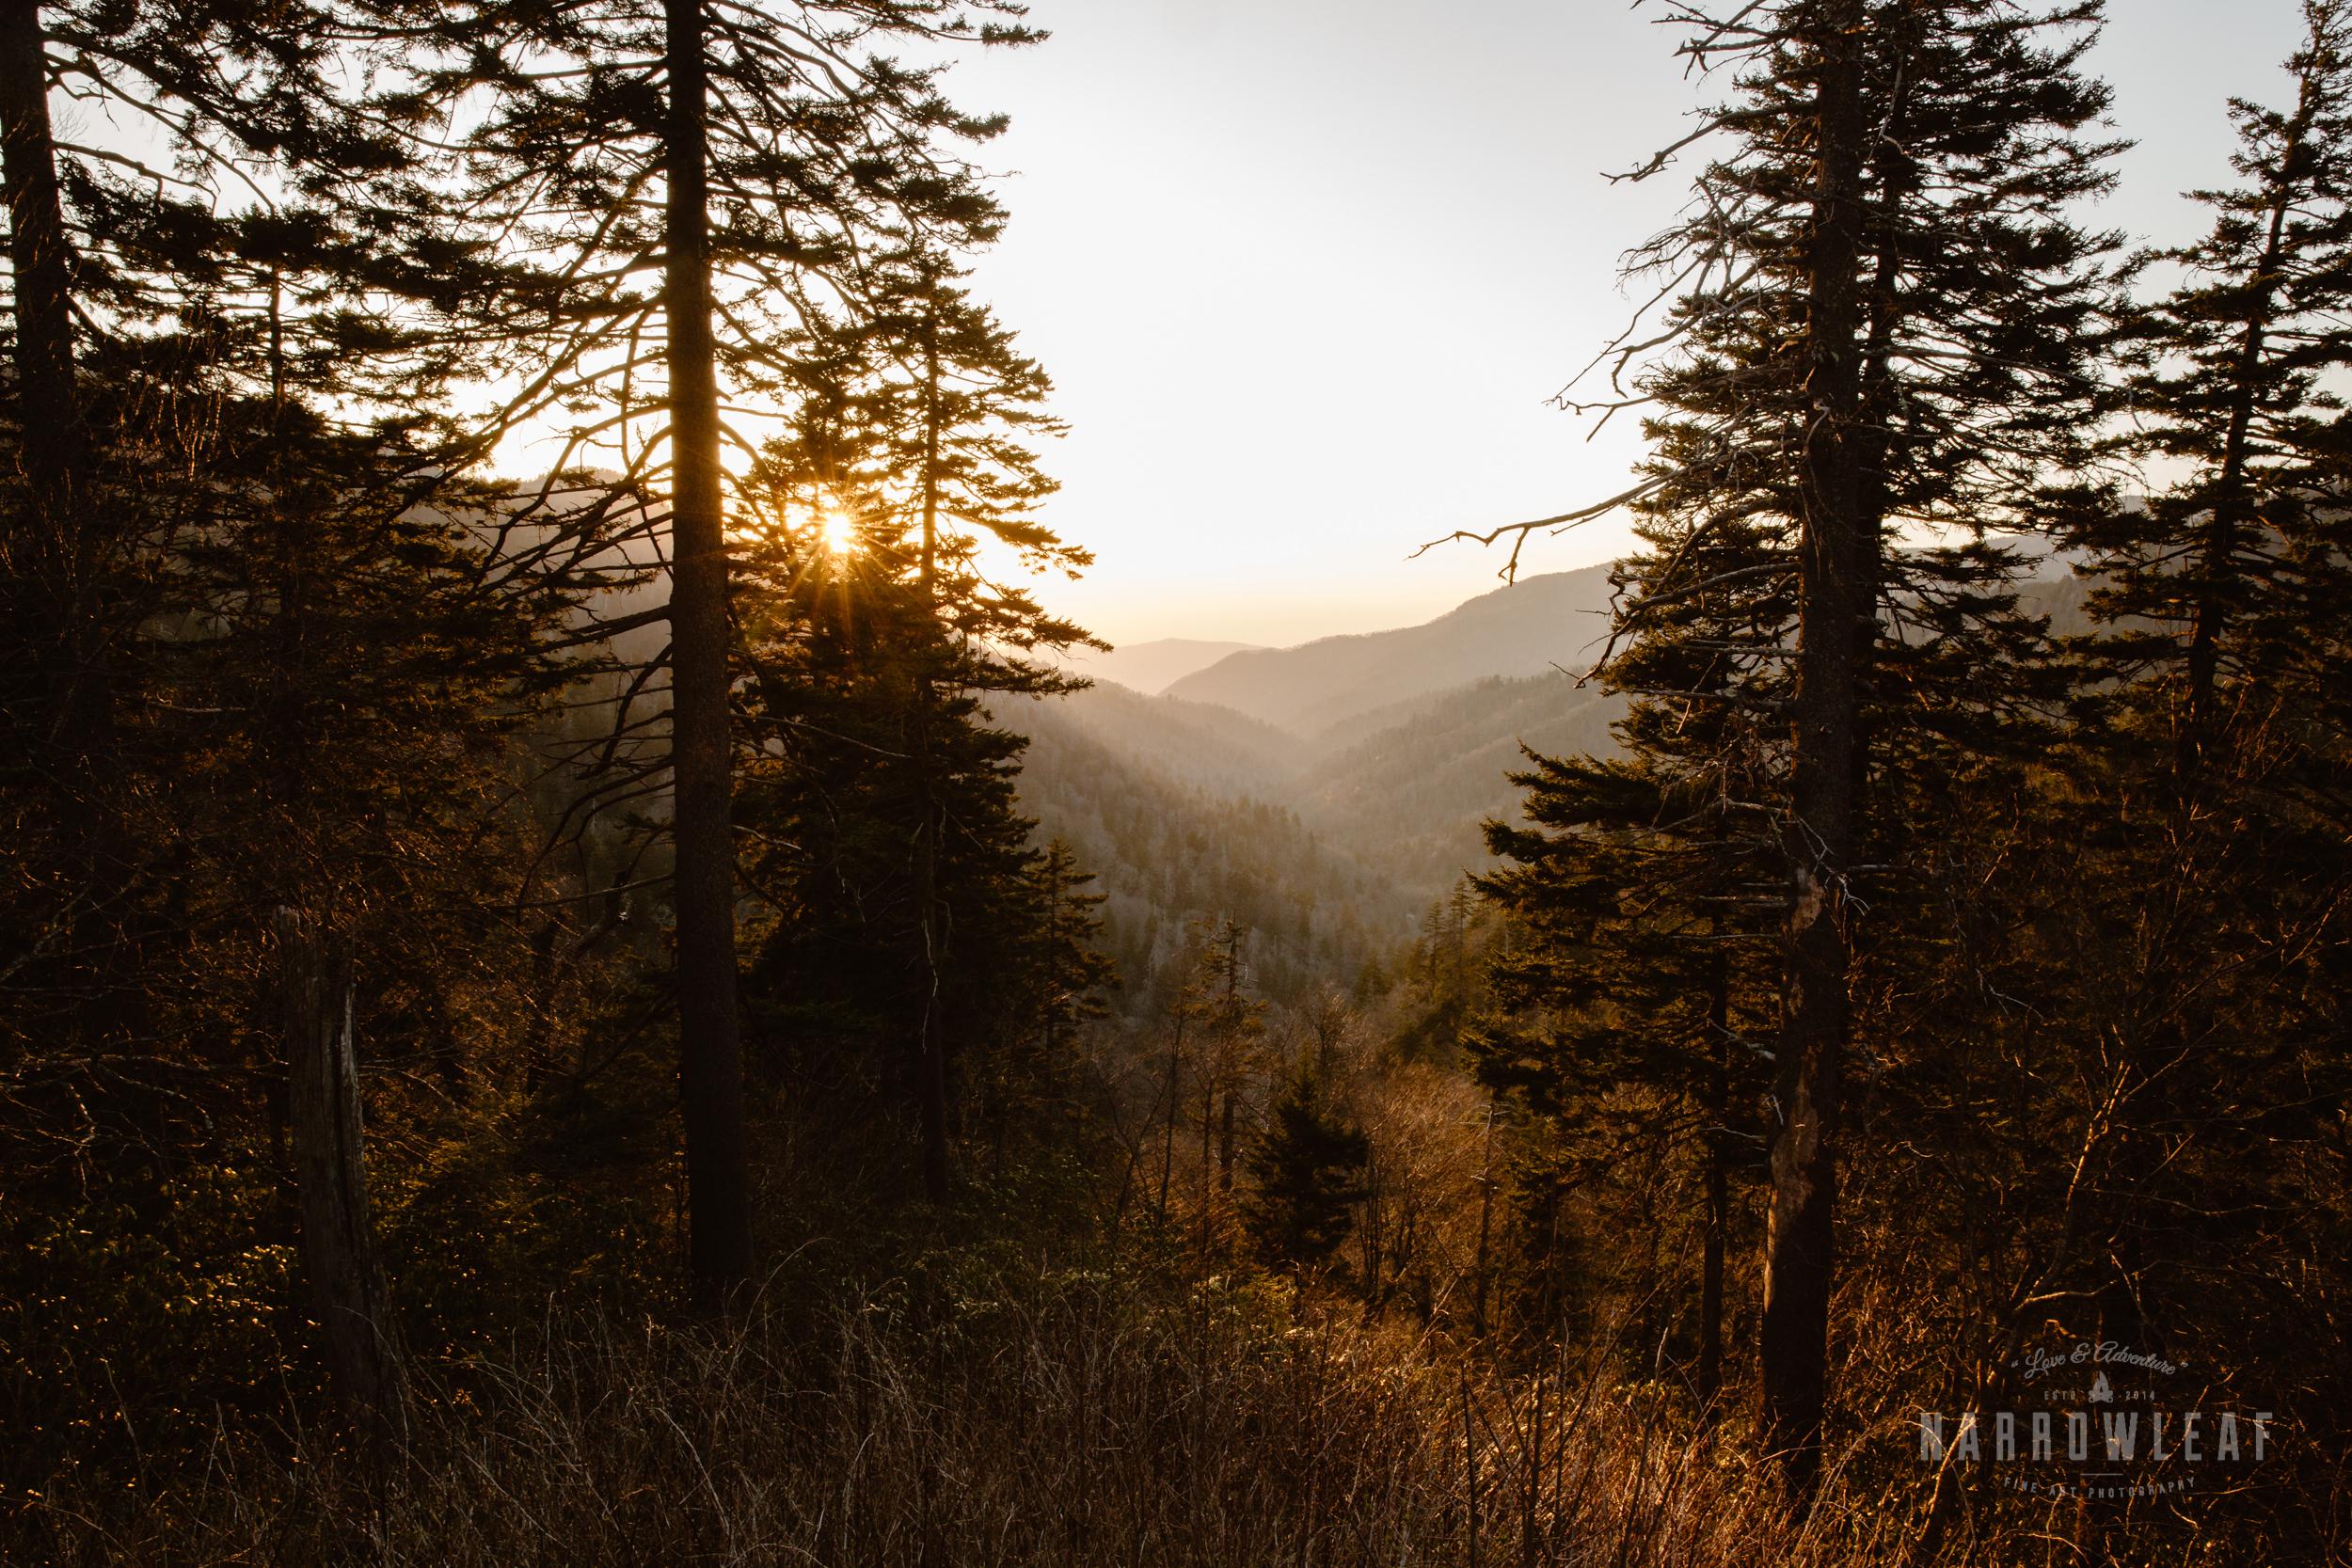 Blue-Ridge-Parkway-North-Carolina-elopement-photographer-Narrowleaf_Love_and_Adventure_Photography-0101.jpg